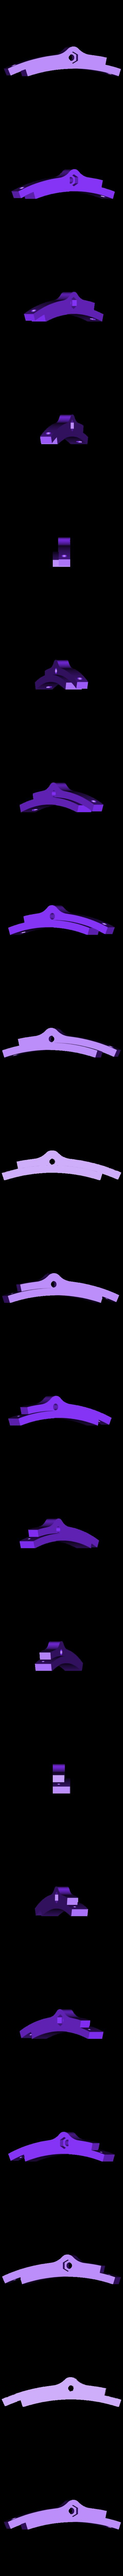 rim1.stl Download free STL file 12 inch e-drum pad with small 3d printer • 3D print model, RyoKosaka